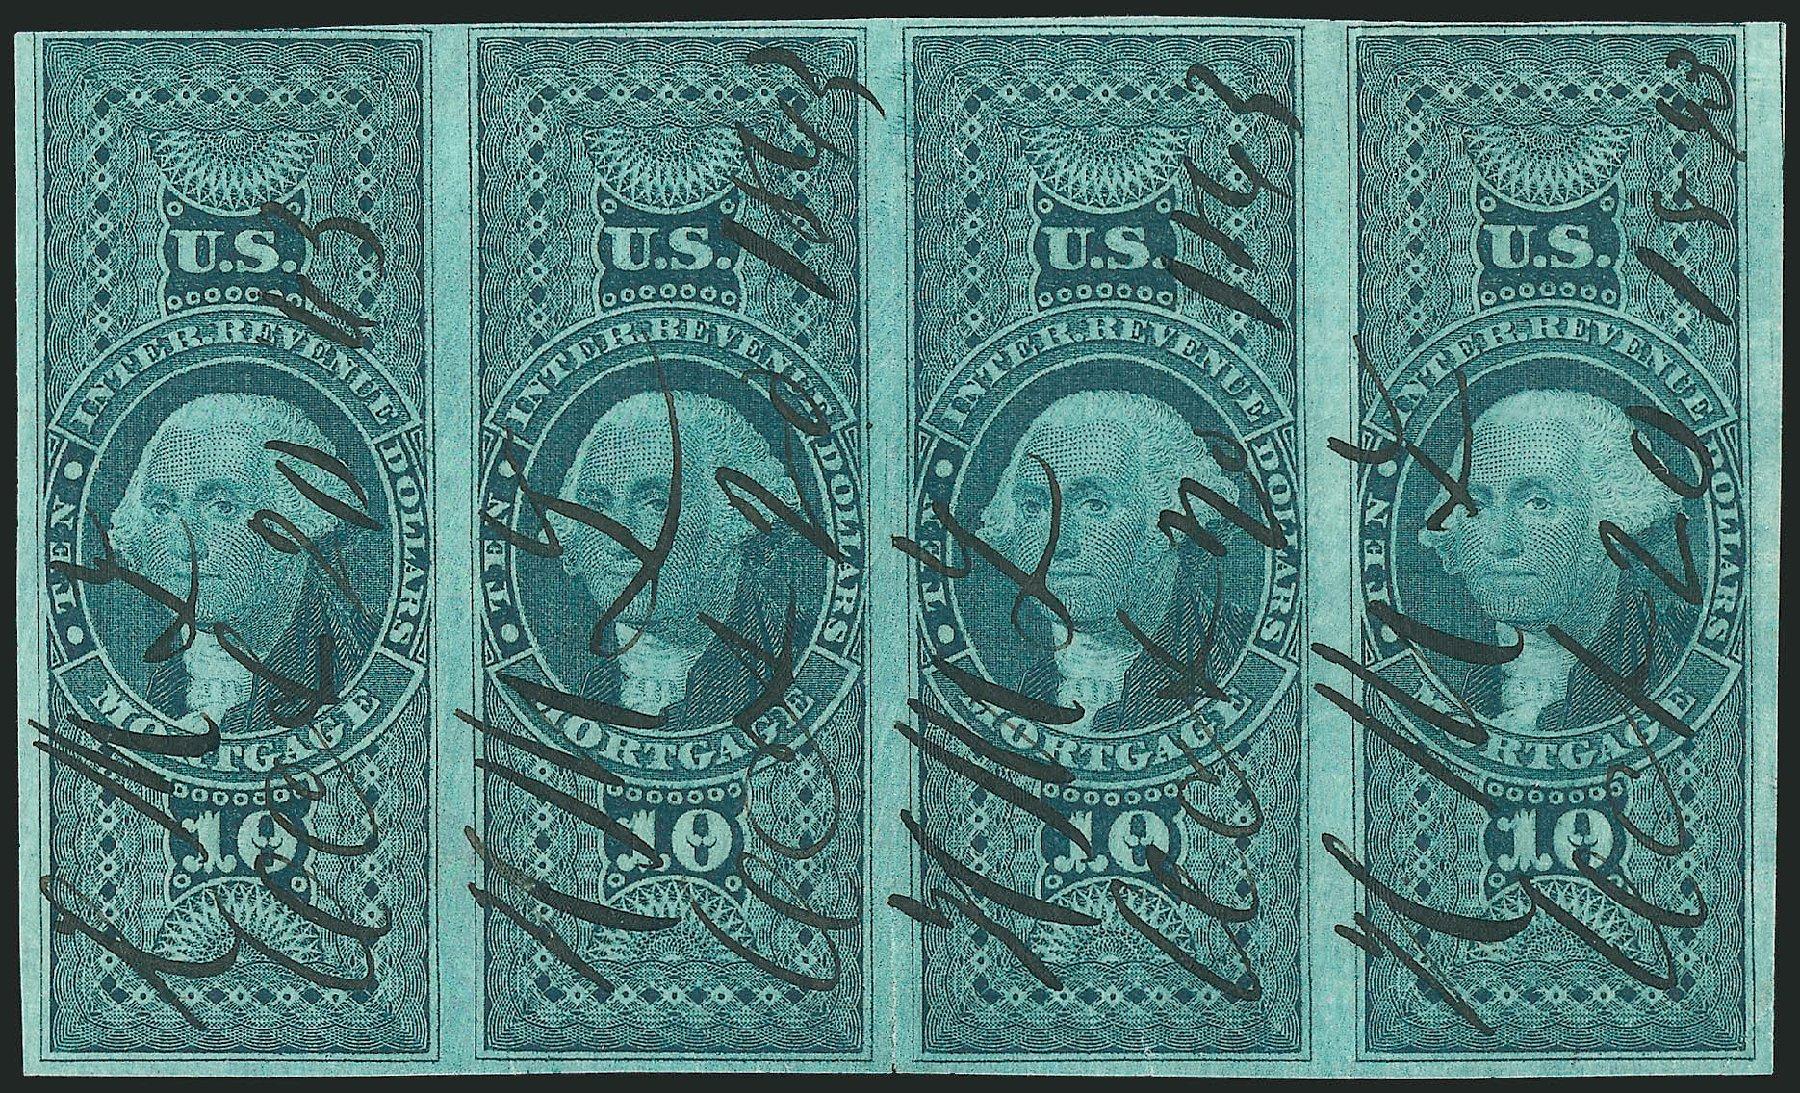 Prices of US Stamp Scott # R95 - US$10.00 1862 Revenue Mortgage. Robert Siegel Auction Galleries, Dec 2014, Sale 1089, Lot 376